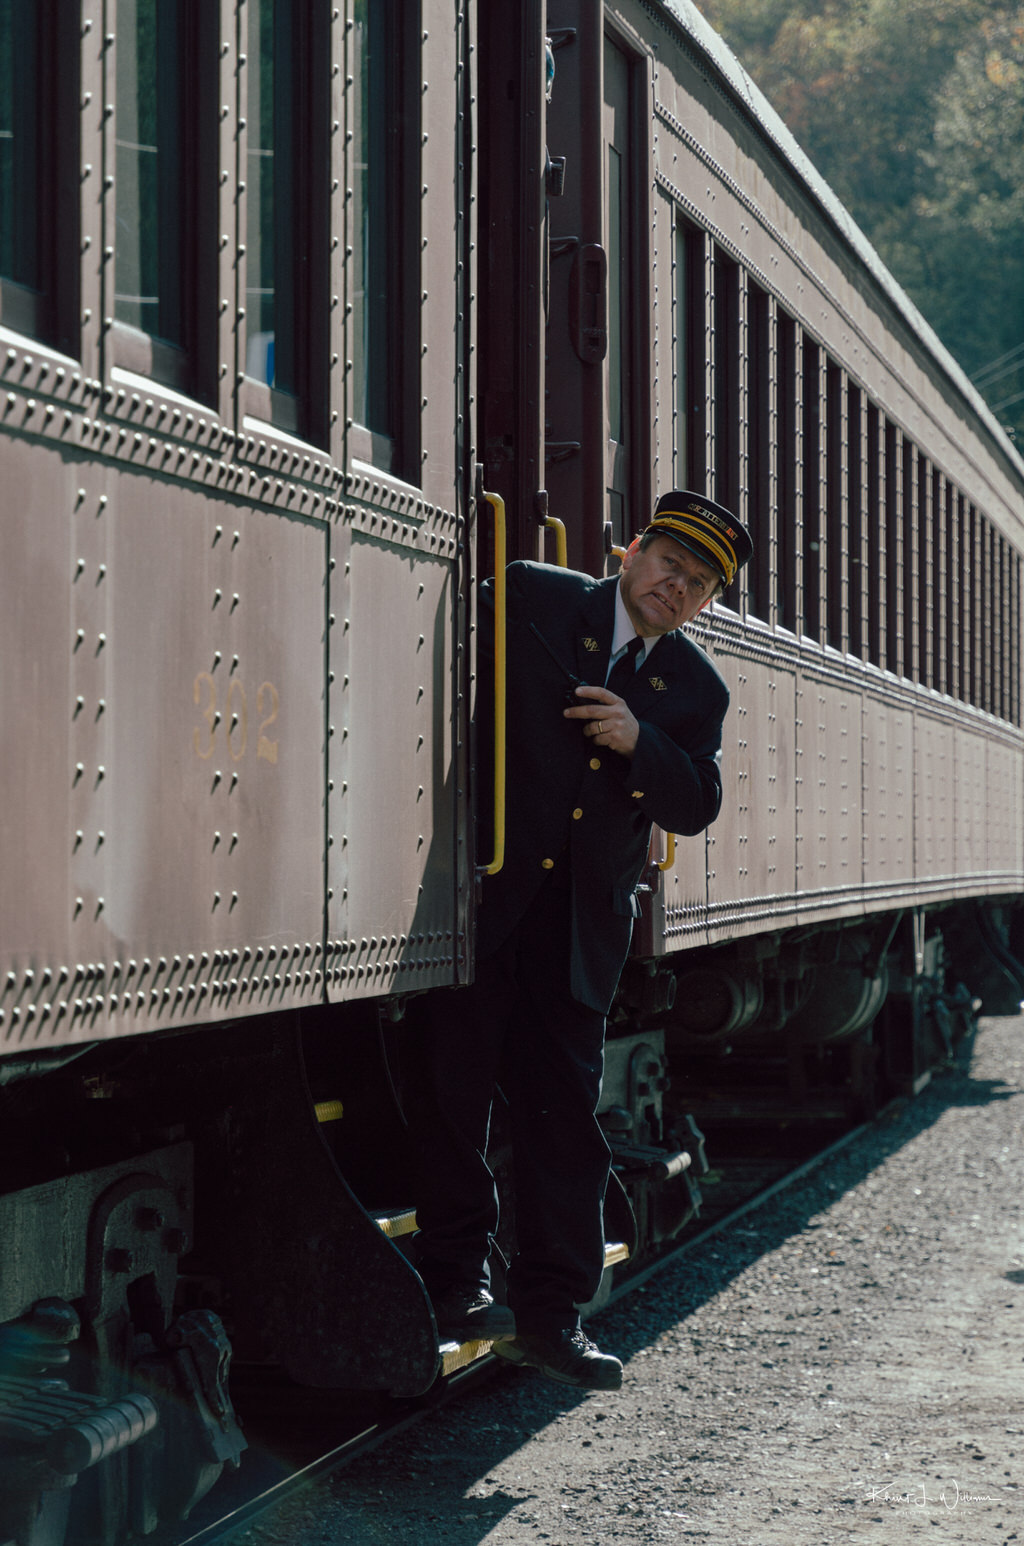 Autumn Leaf Excursion to Jim Thorpe on the Lehigh Gorge Scenic Railway Lehigh Gorge Railway Jim Thorpe Autum Leaf Excursion NIKON D5100 20161023 5160 1